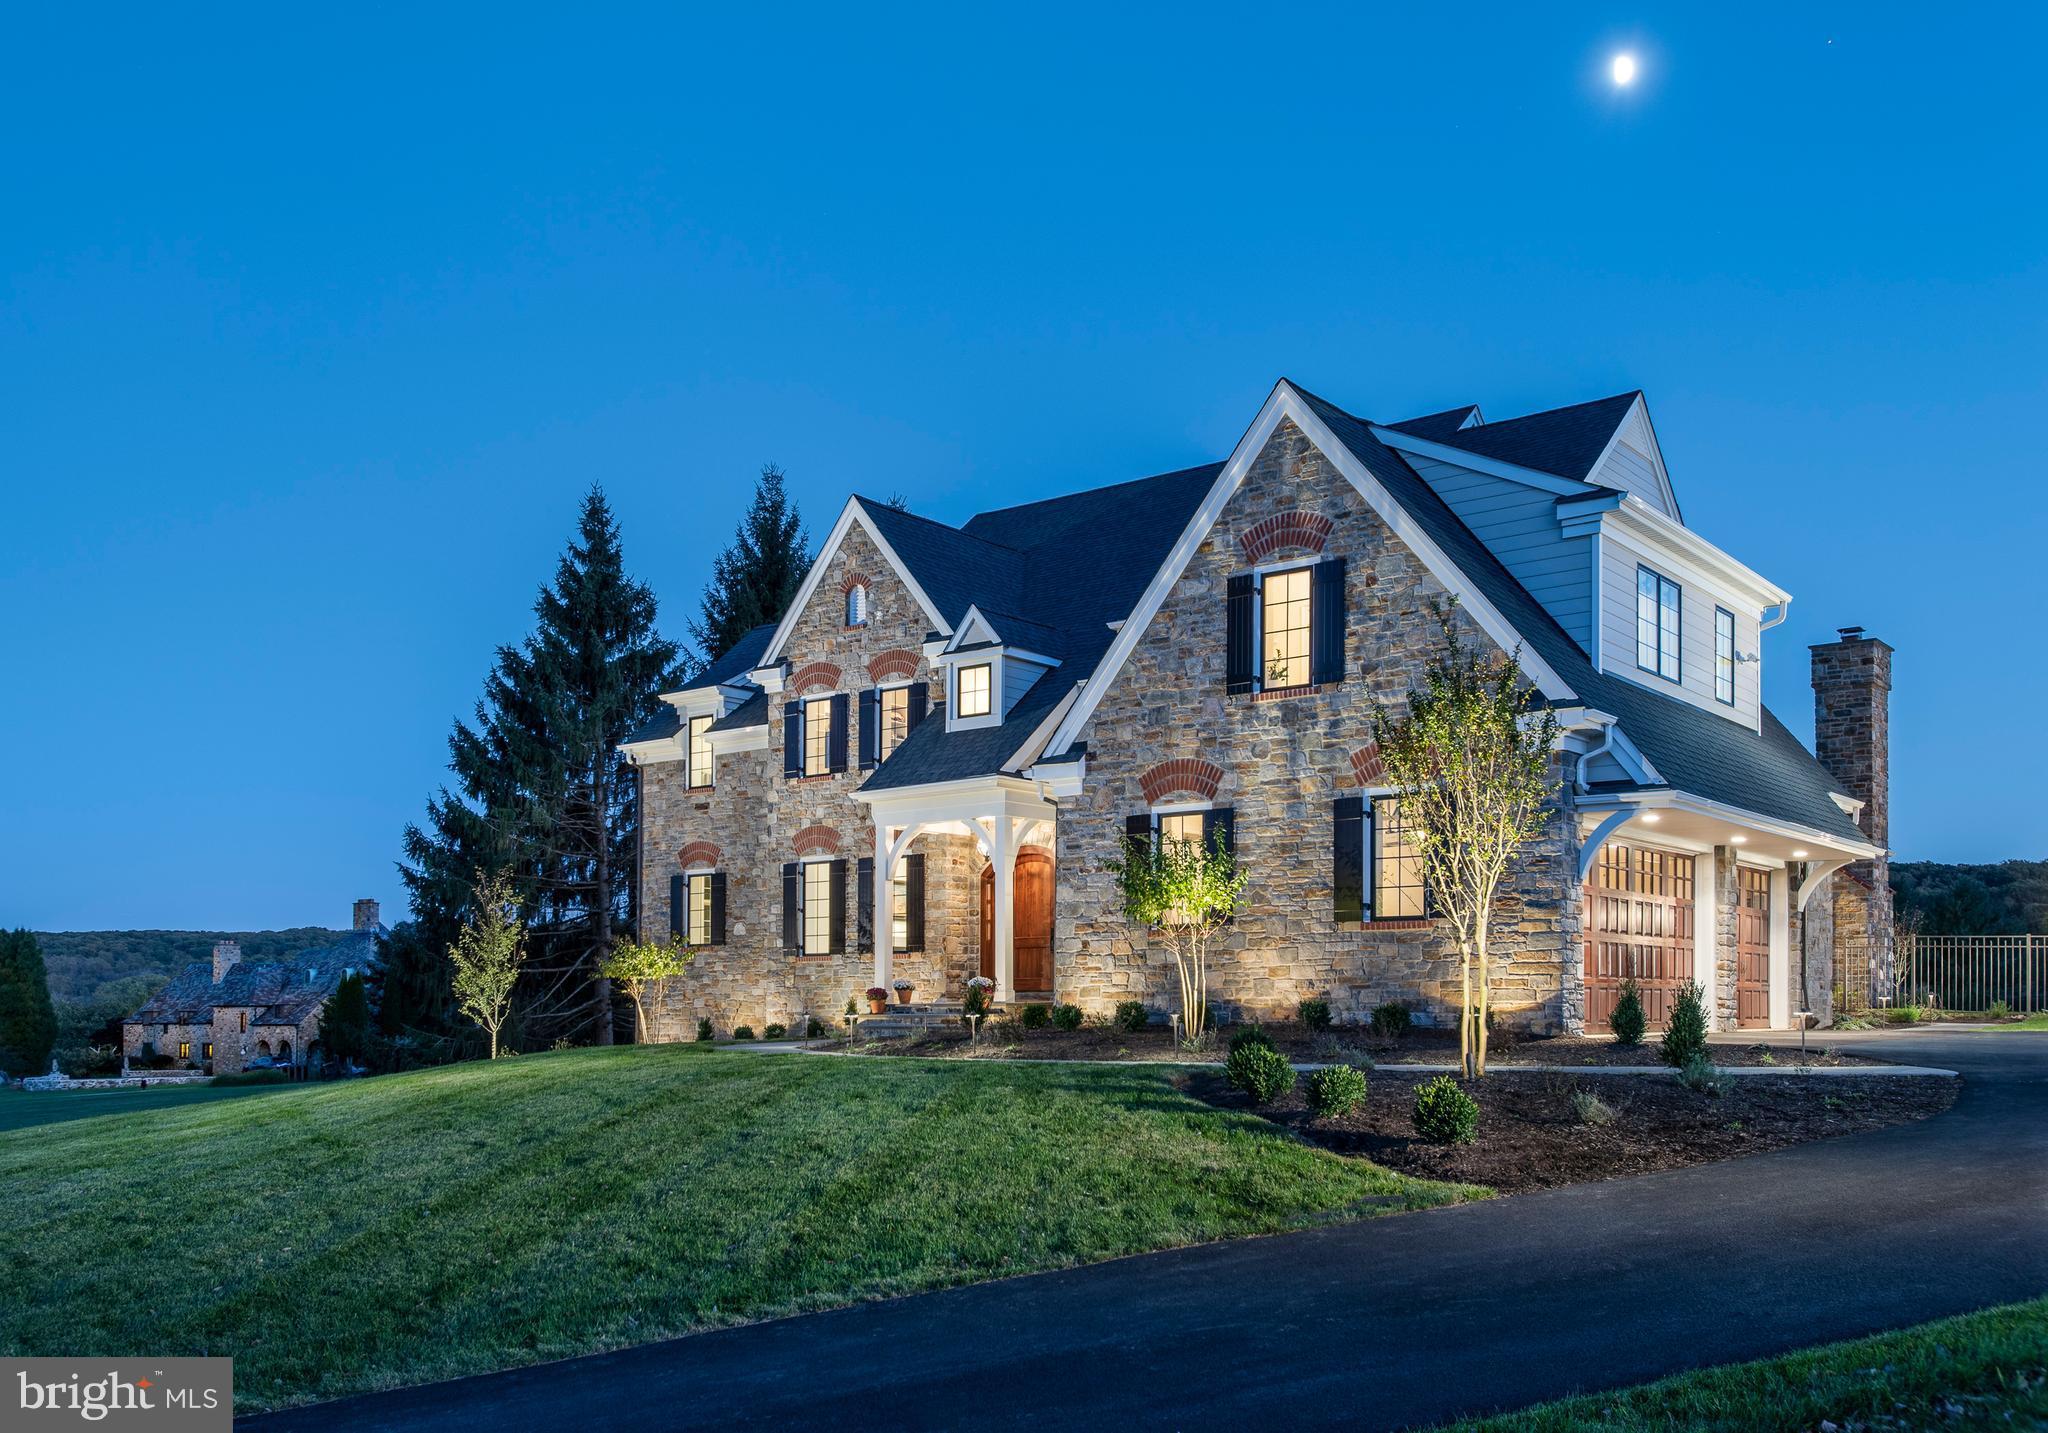 553A HOPWOOD ROAD, COLLEGEVILLE, Pennsylvania 19426, 4 Bedrooms Bedrooms, ,5 BathroomsBathrooms,Single Family,For Sale,553A HOPWOOD ROAD,PAMC687462